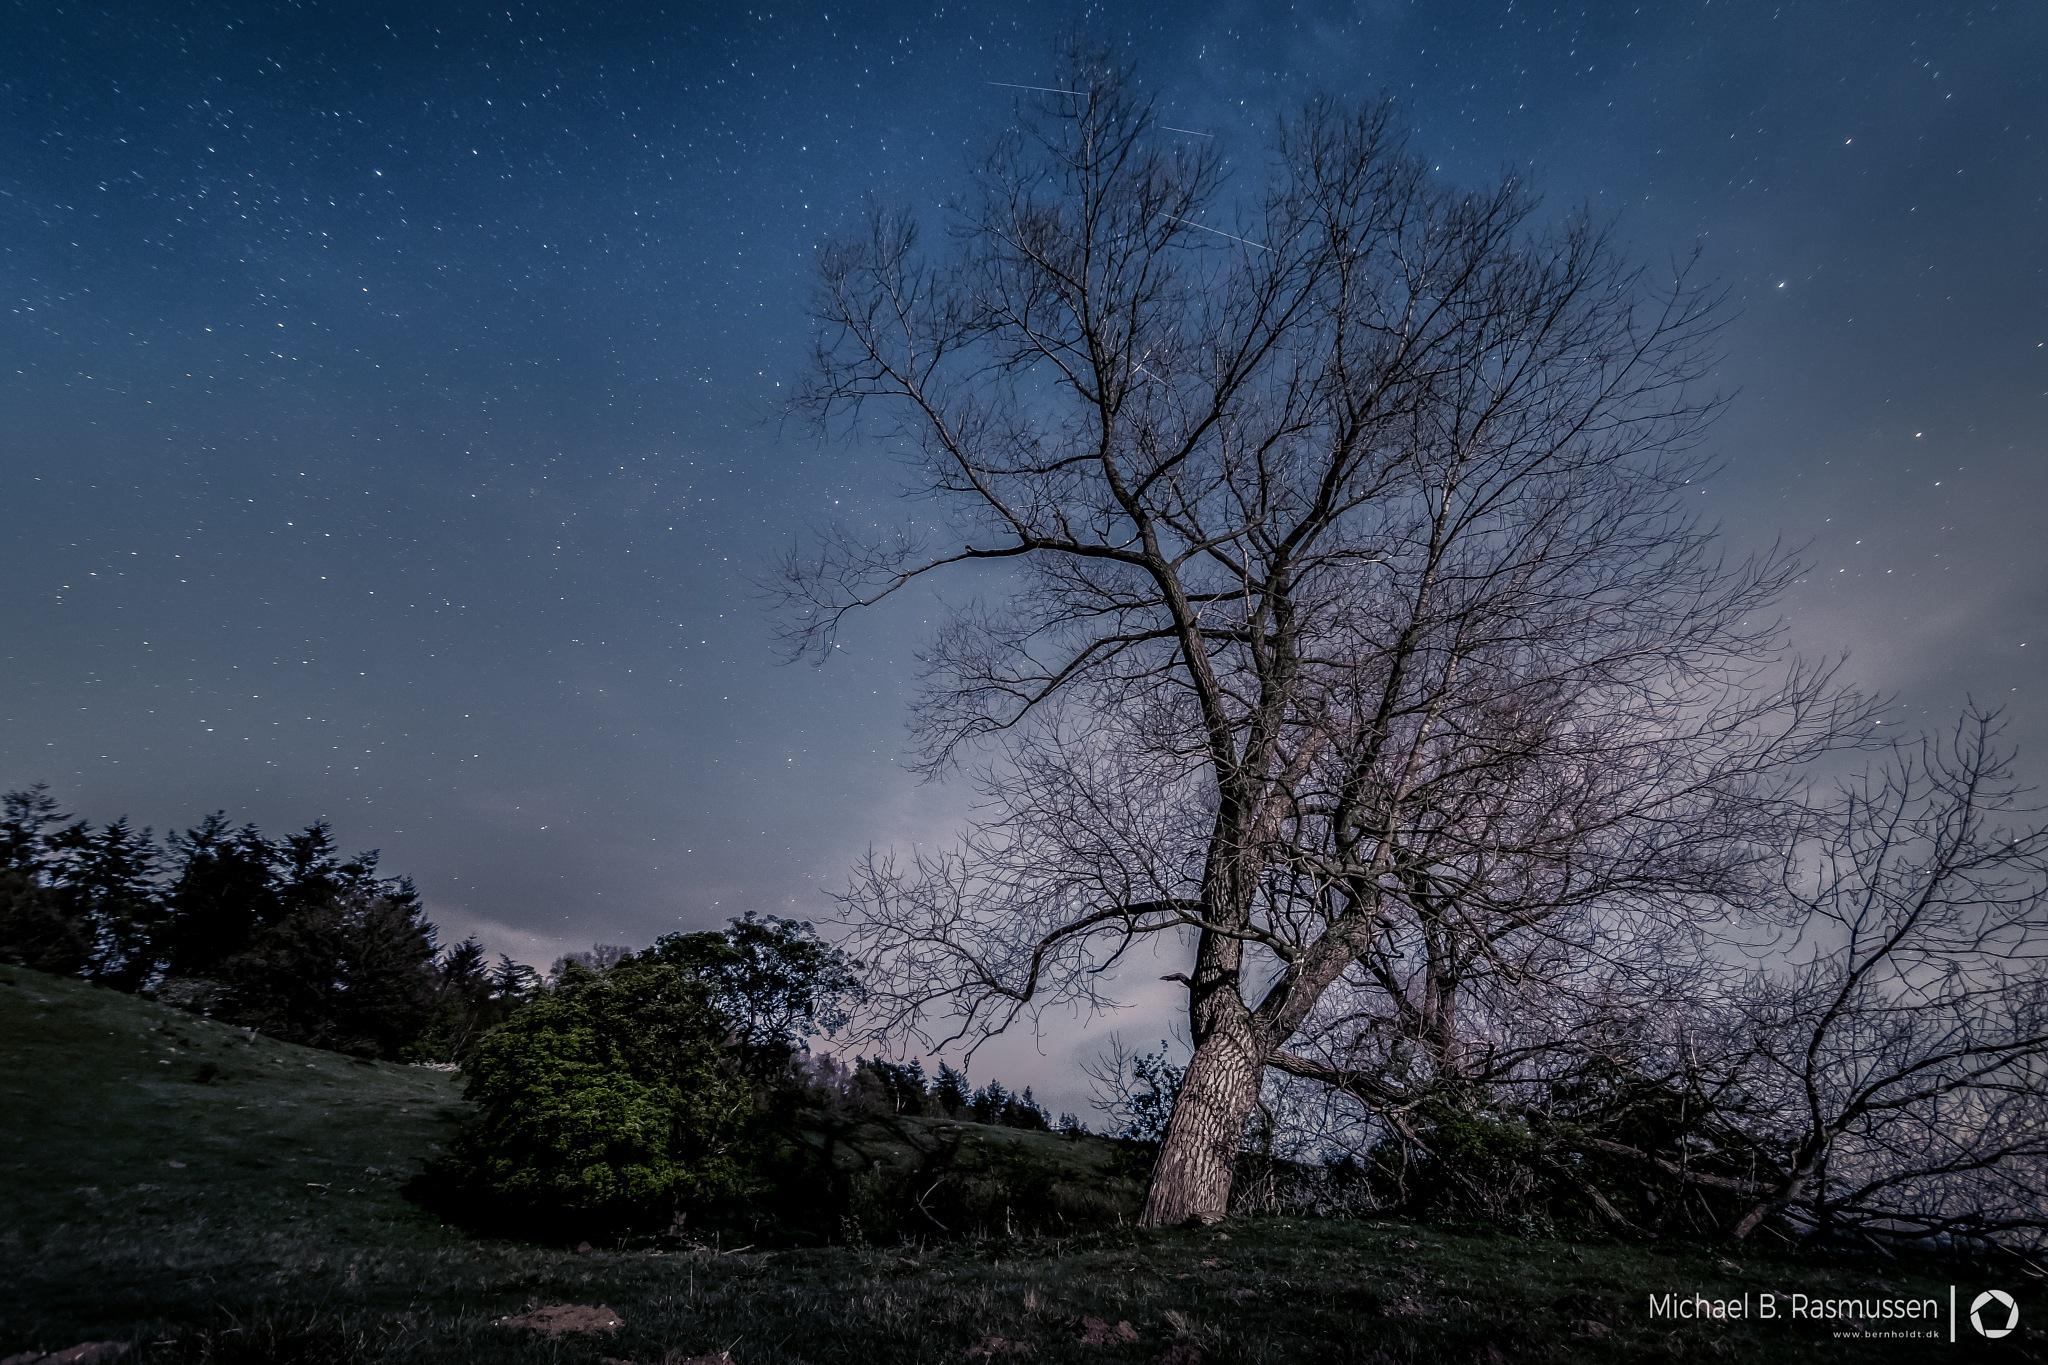 Meteors oover the tree by Michael B. Rasmussen